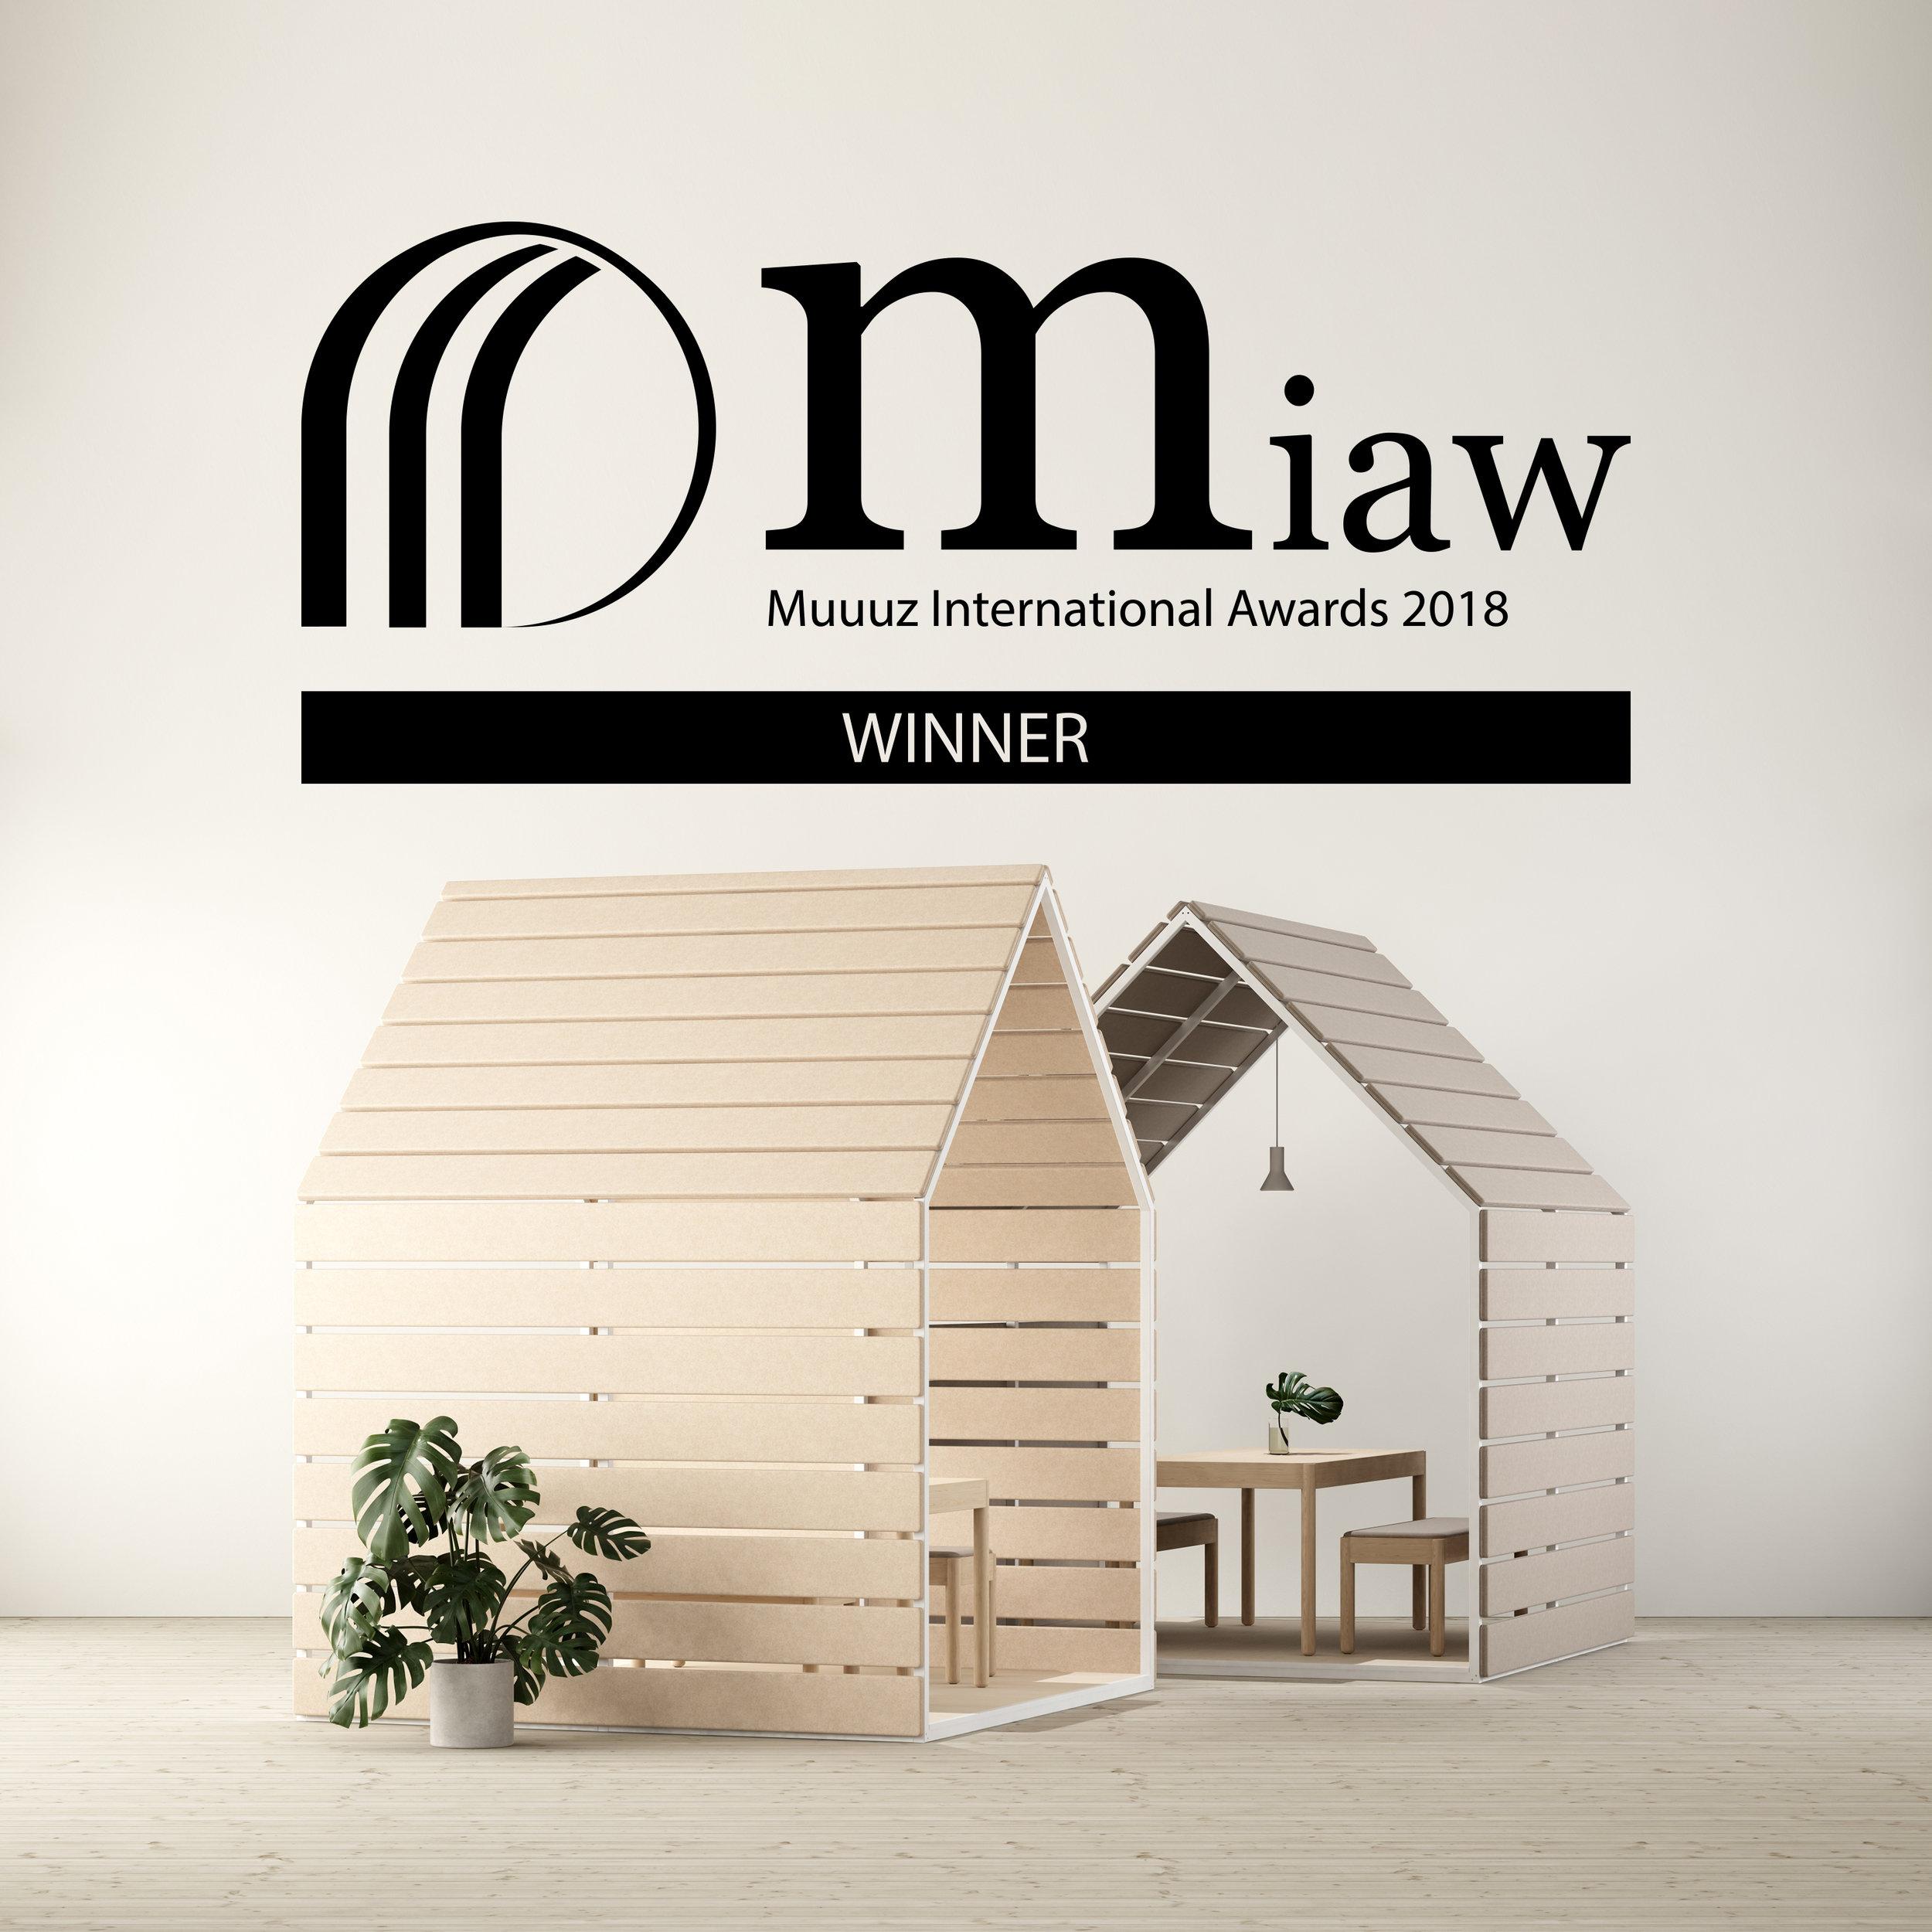 MIAW - Muuuz International Award 2018, The barn & Fences by Johan Kauppi for Glimakra of Sweden